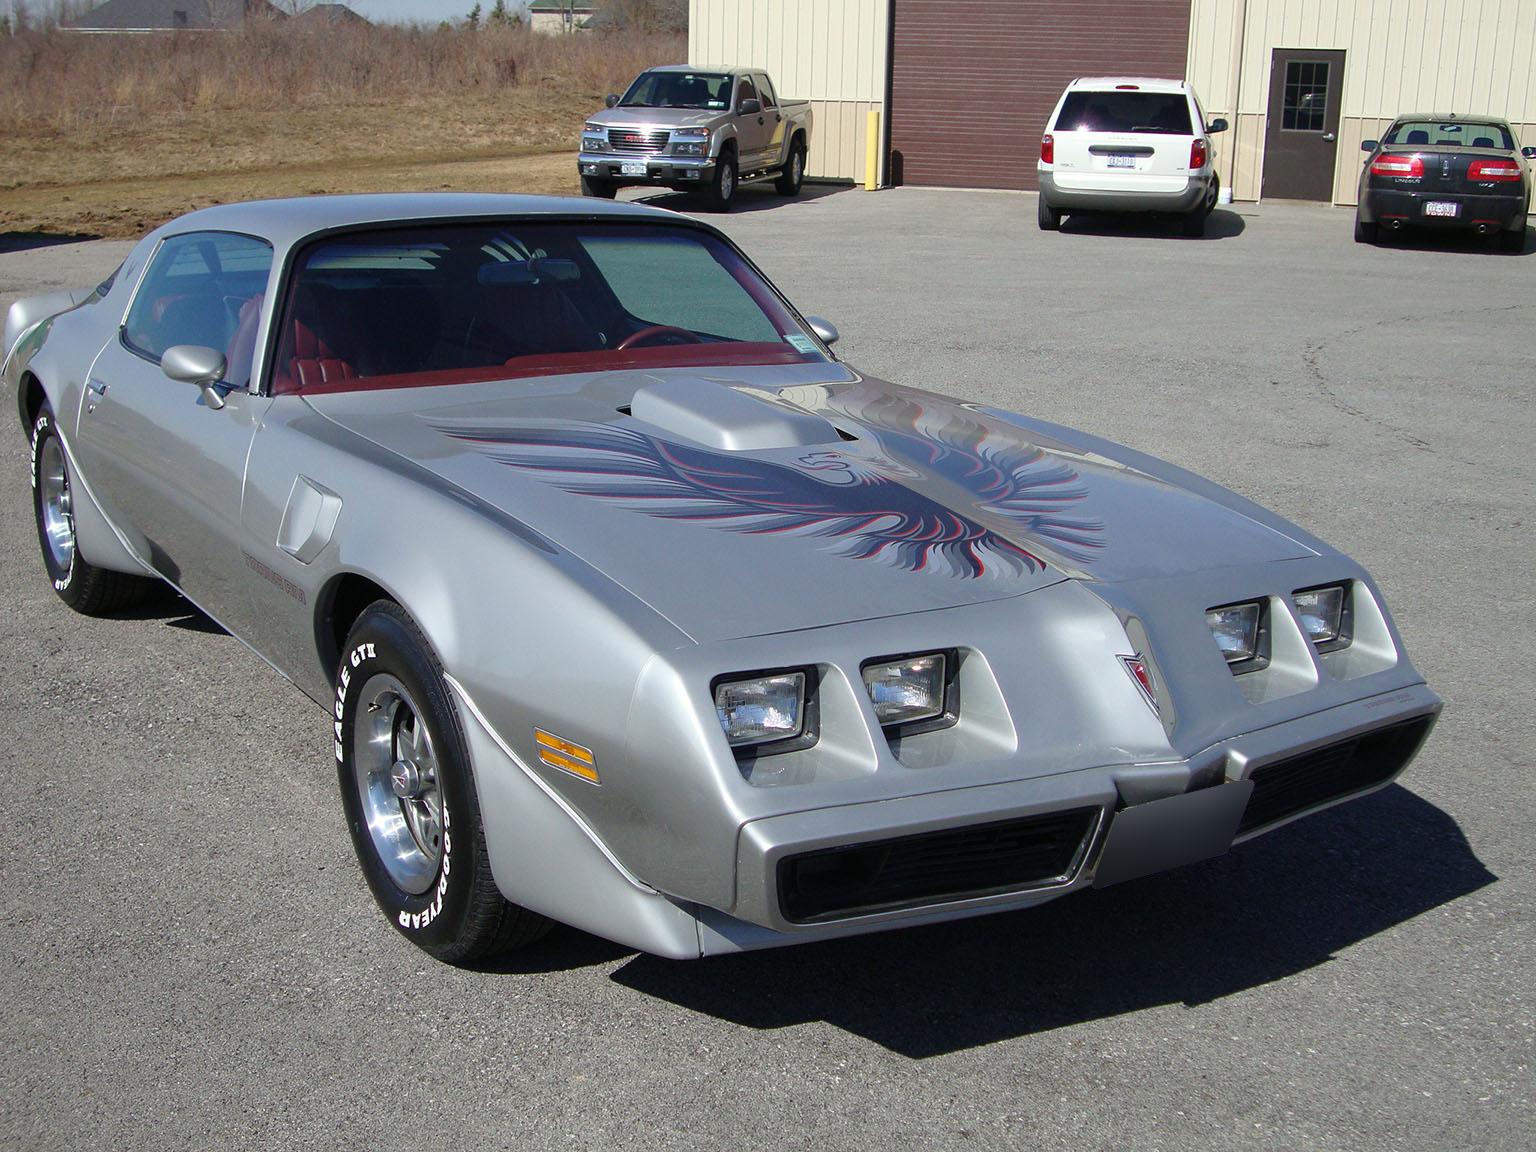 Collision Repair Center >> 1979 Pontiac Trans Am - S & S Auto Body of Clarence Inc.